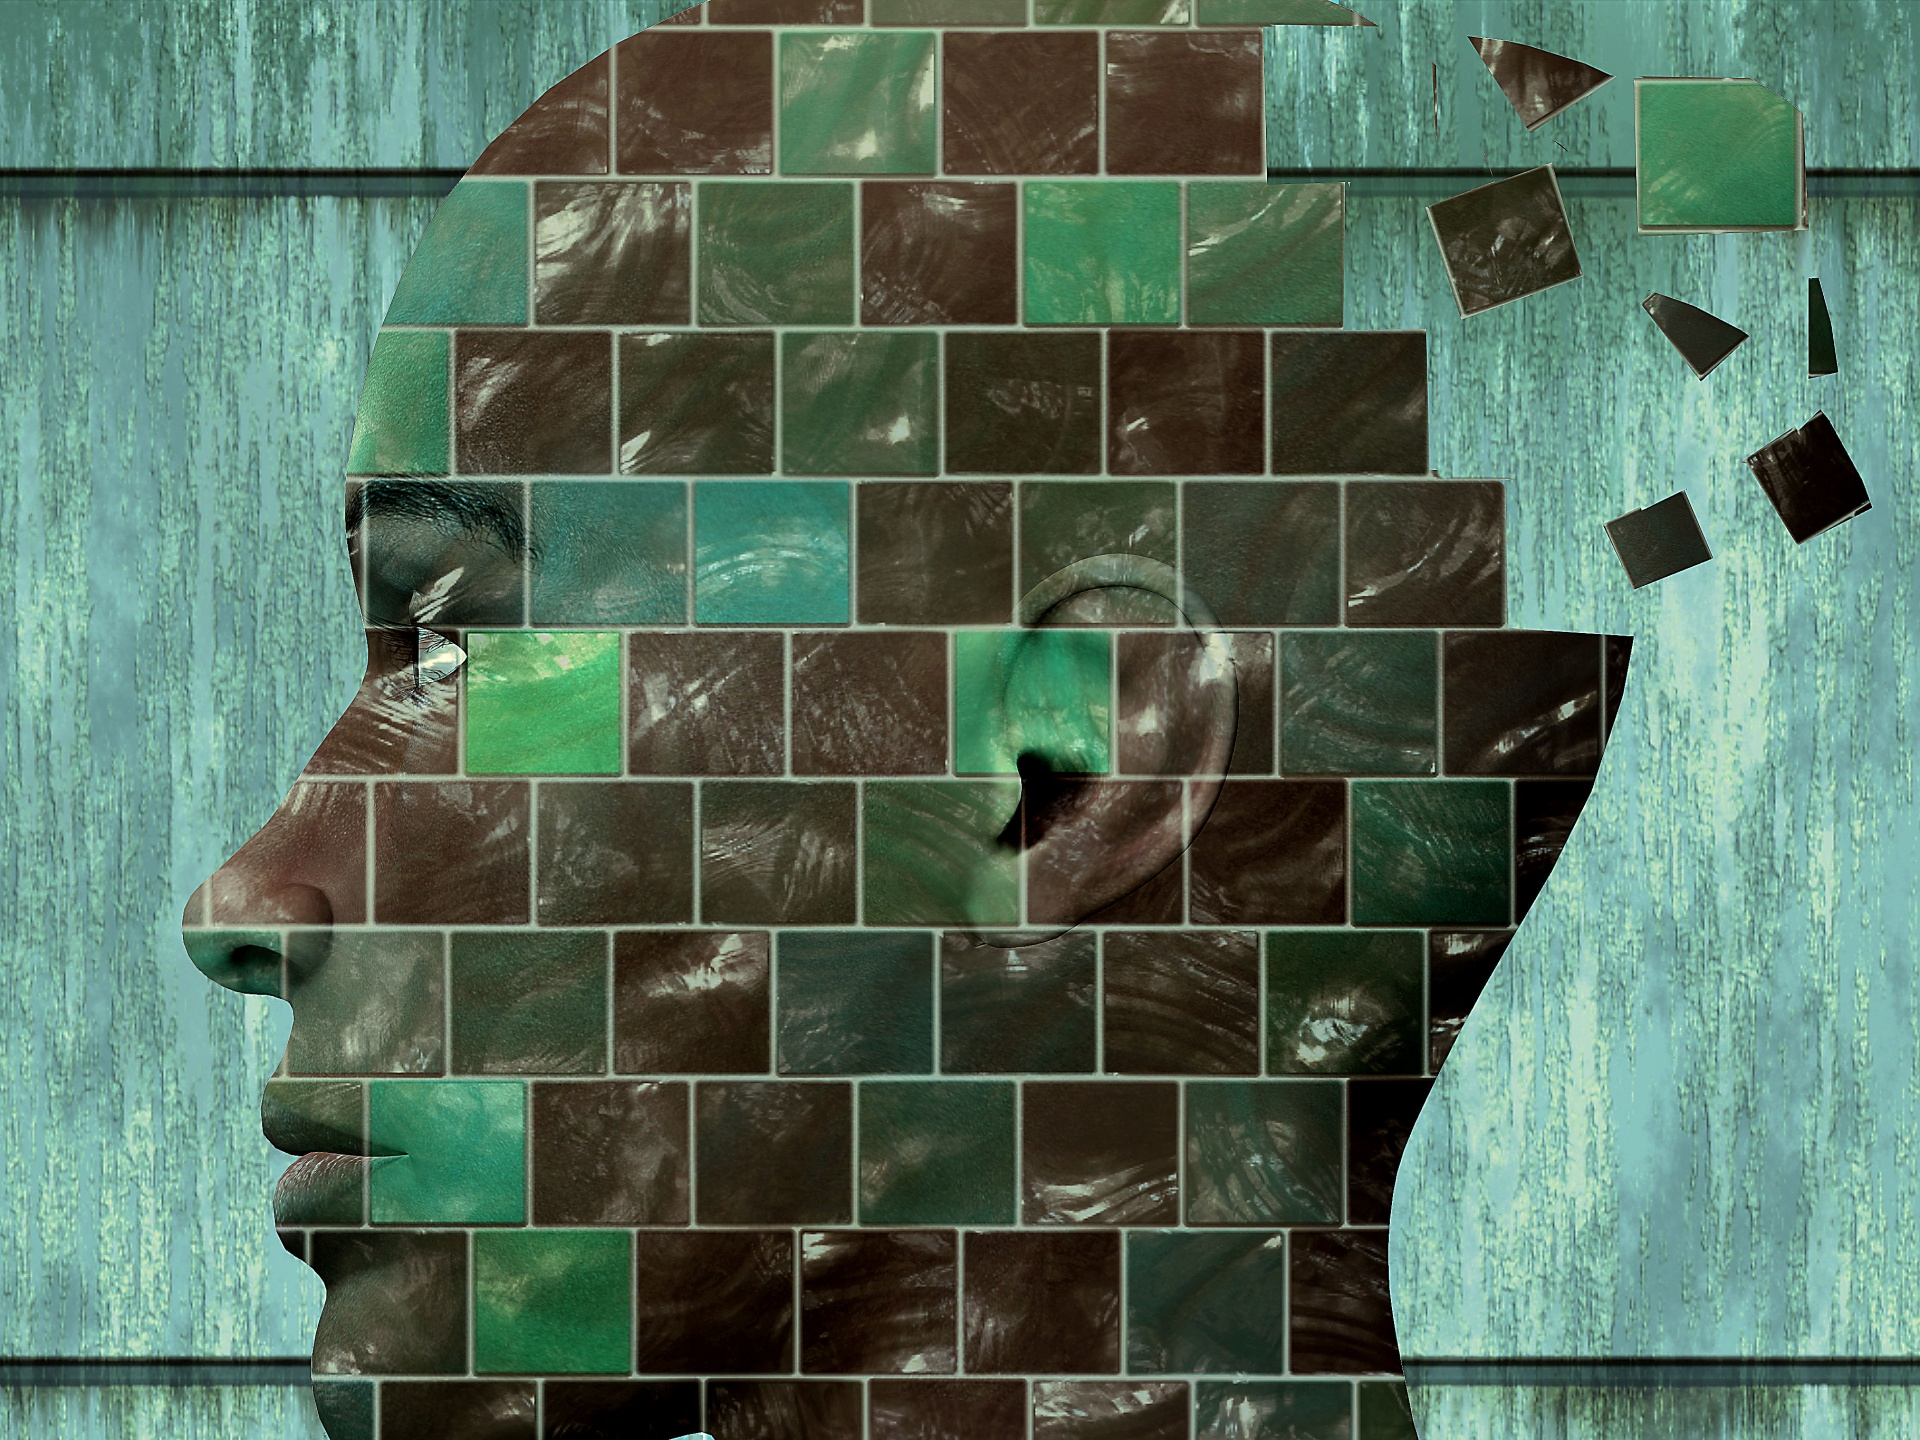 Thinking, Learning